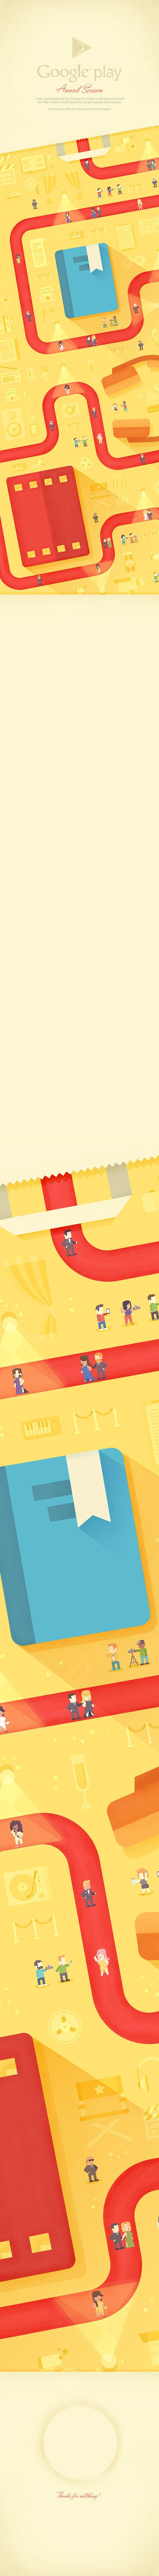 https://www.behance.net/gallery/24028127/Google-Play-Award-Season 0997ea07e69296c3671885465ee6b7c8.jpeg (JPEG Image, 730×11856 pixels)